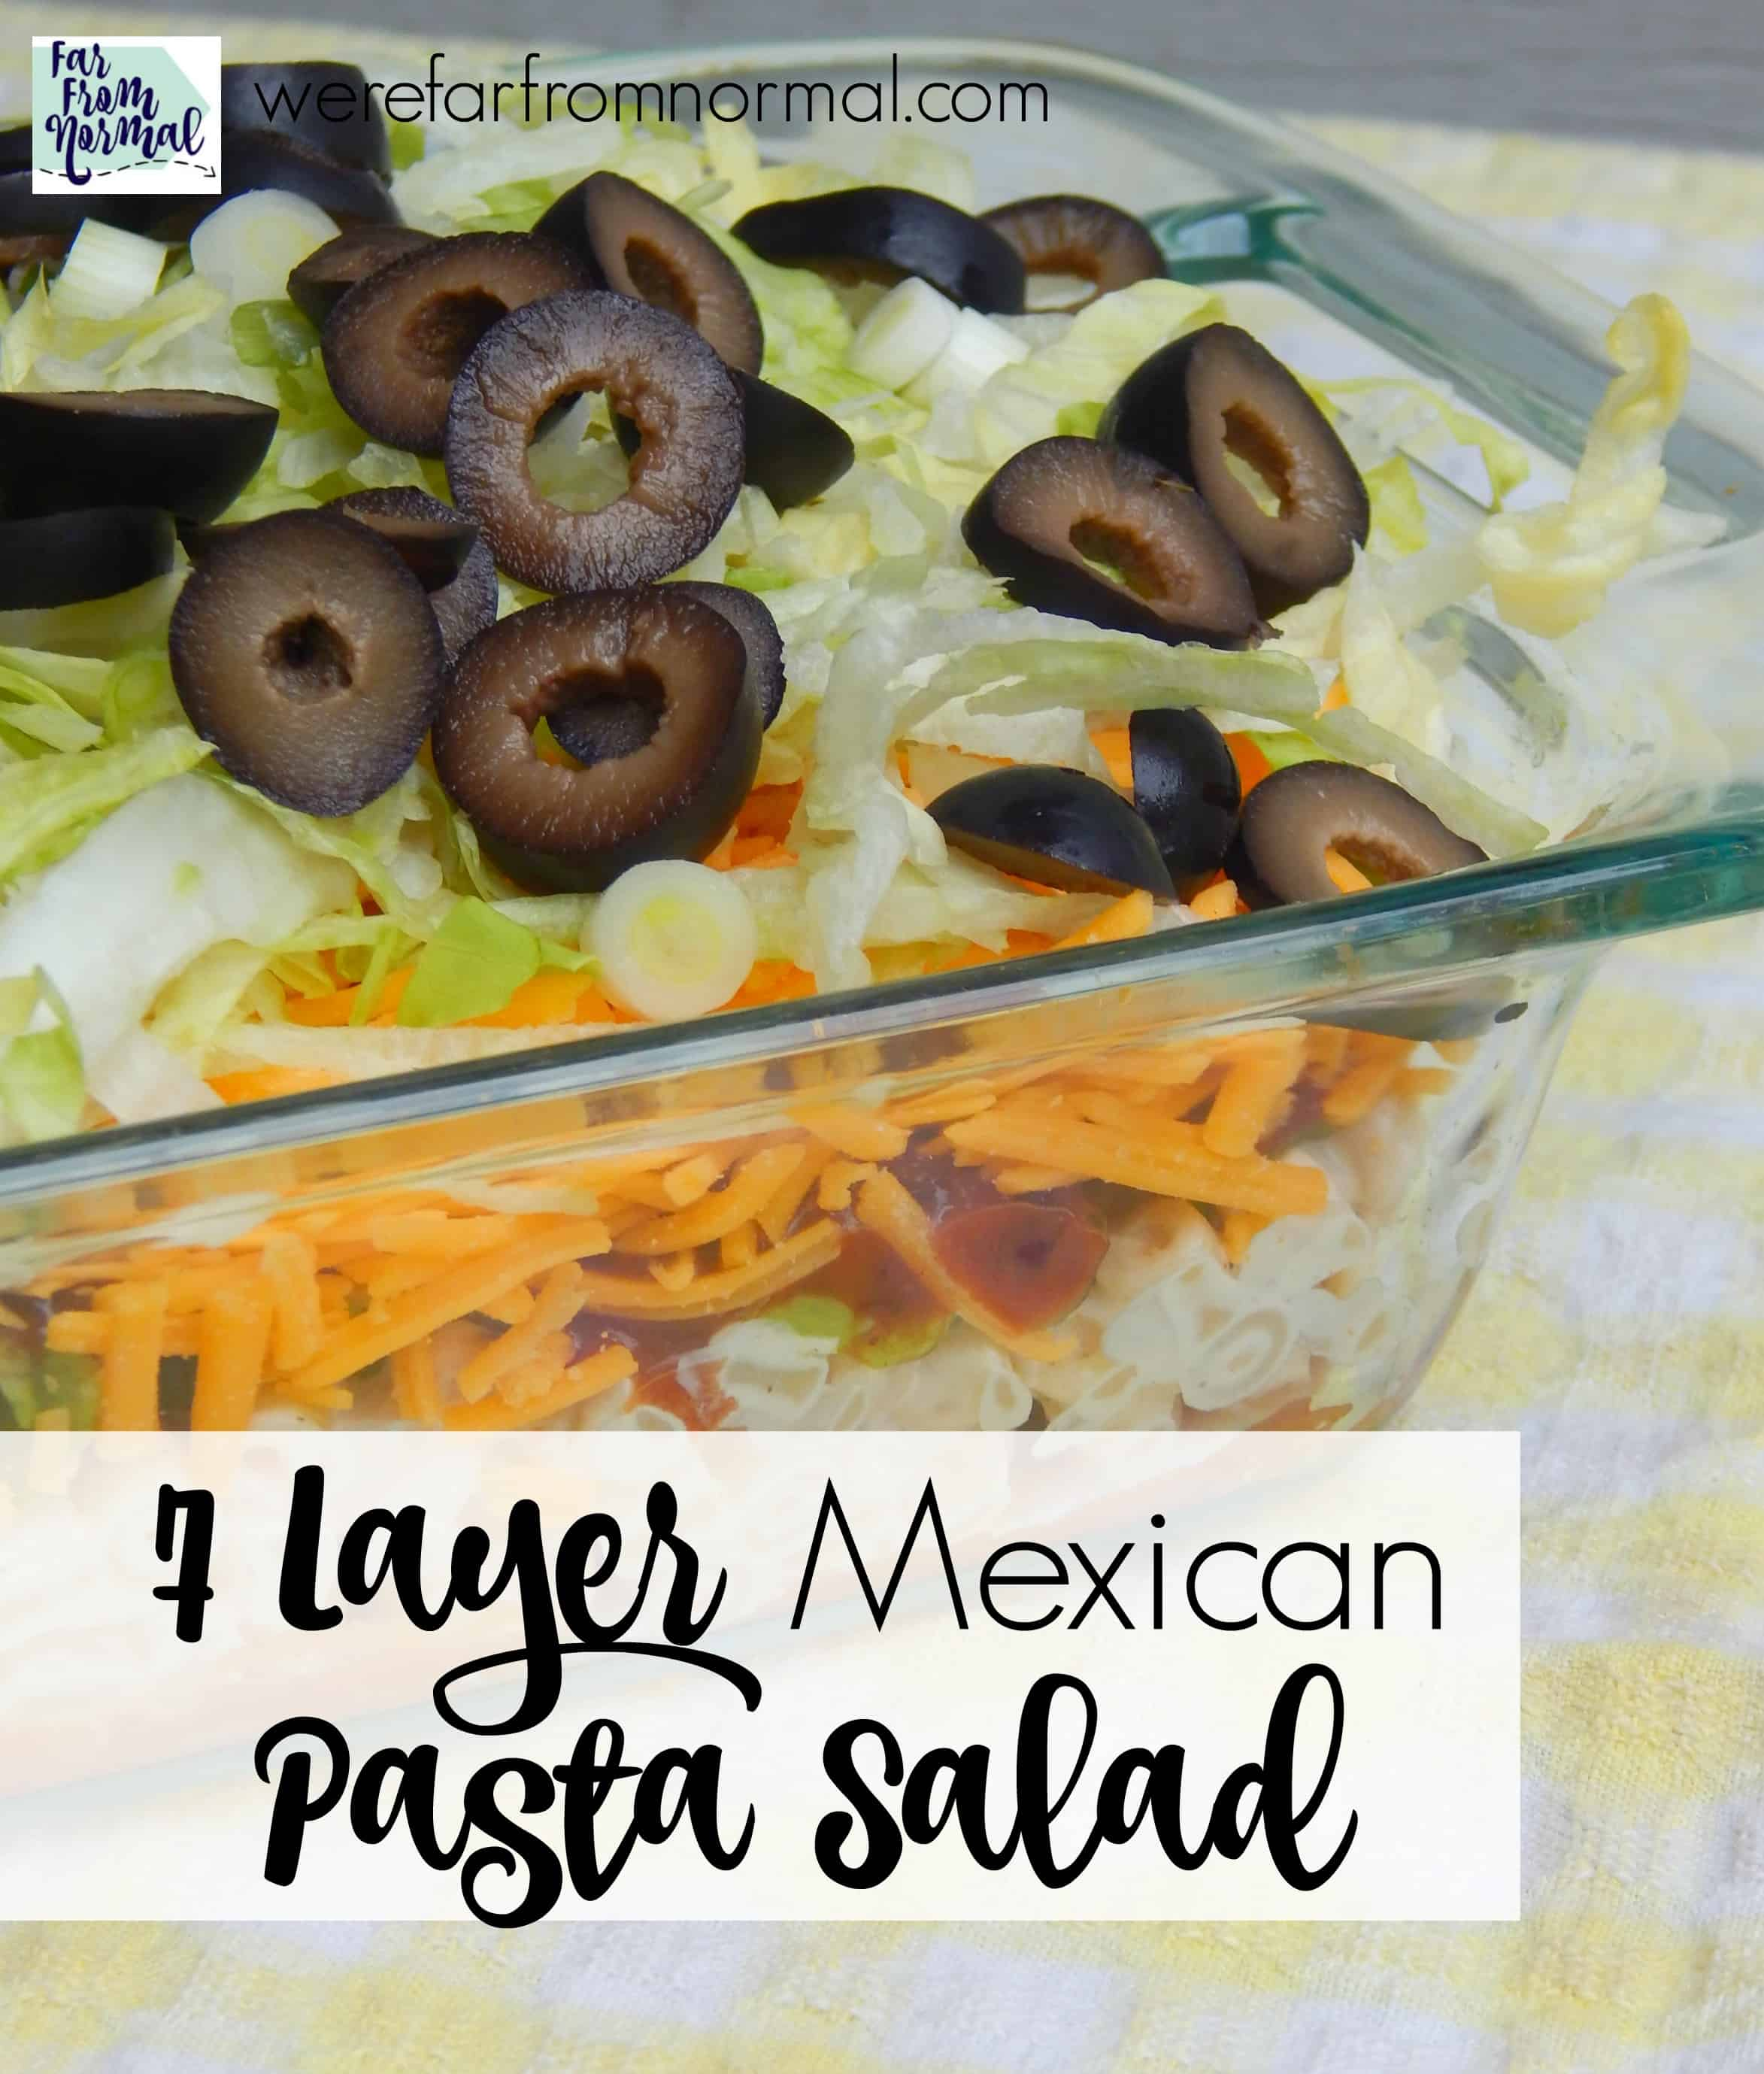 Mexican 7 Layer Pasta Salad